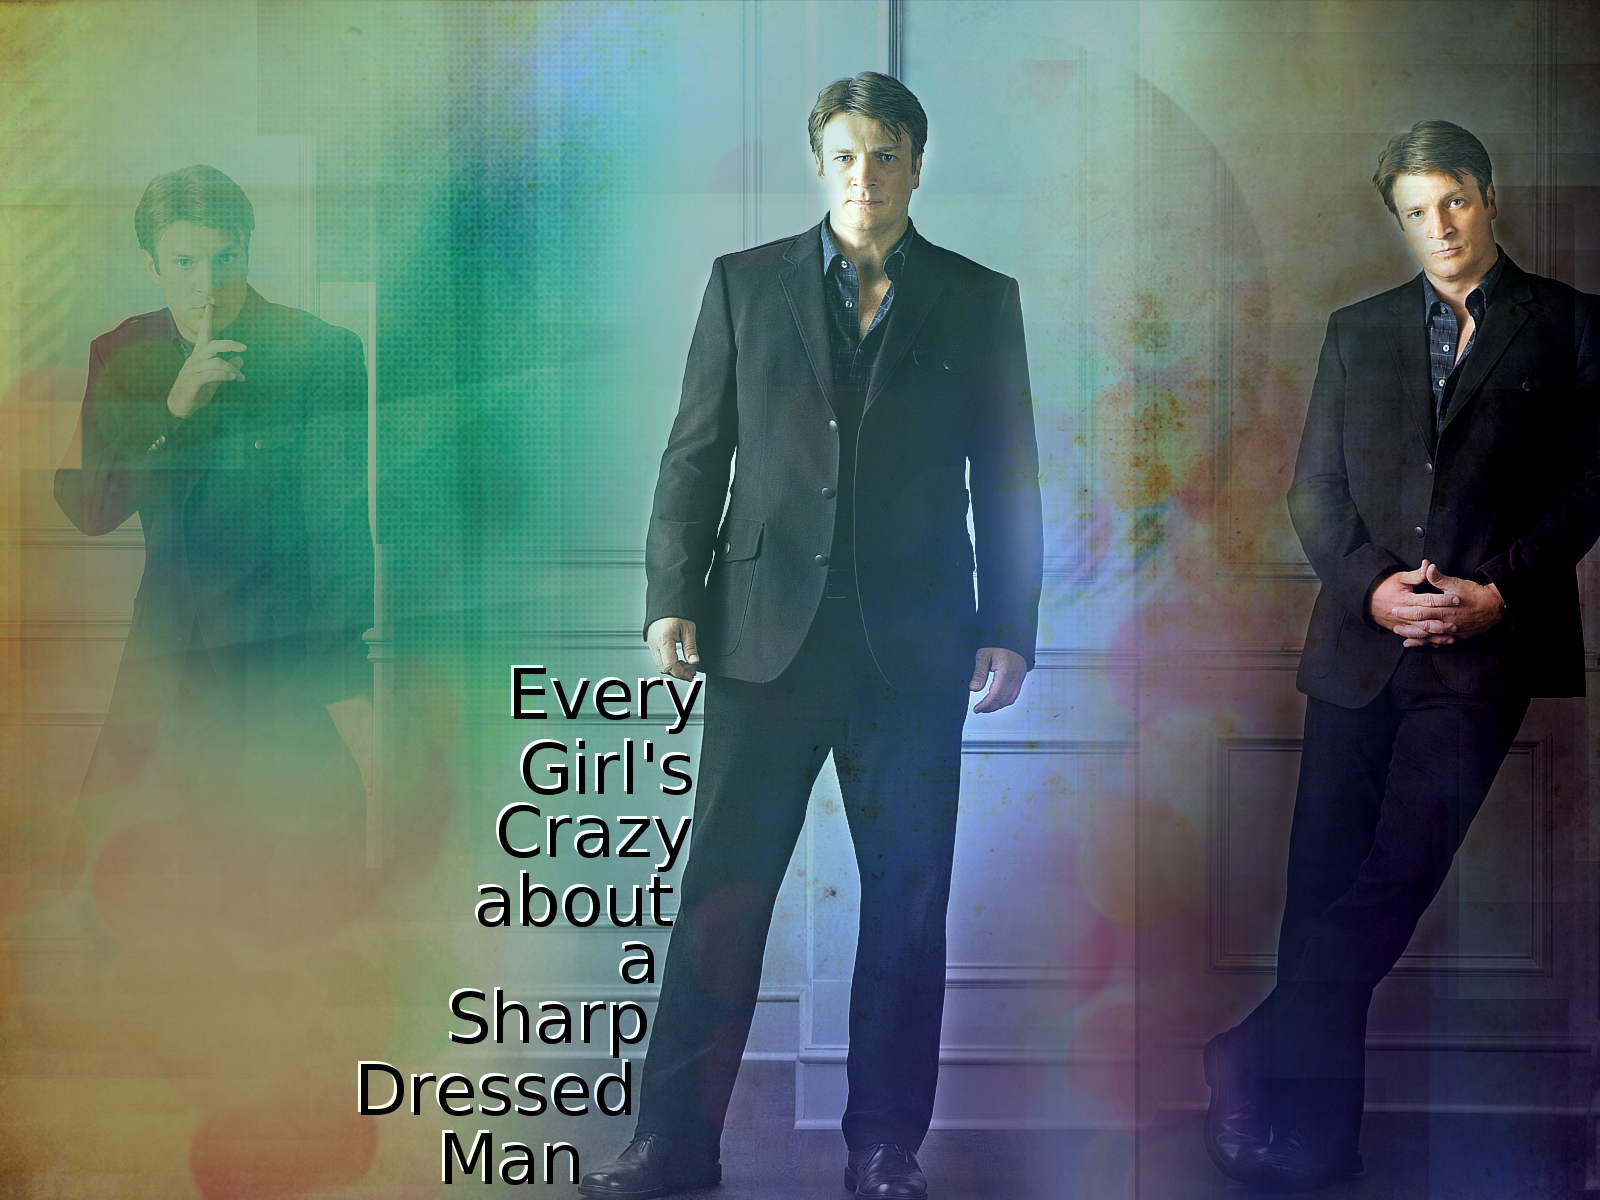 Smart Dressed Man - Nathan Fillion :)